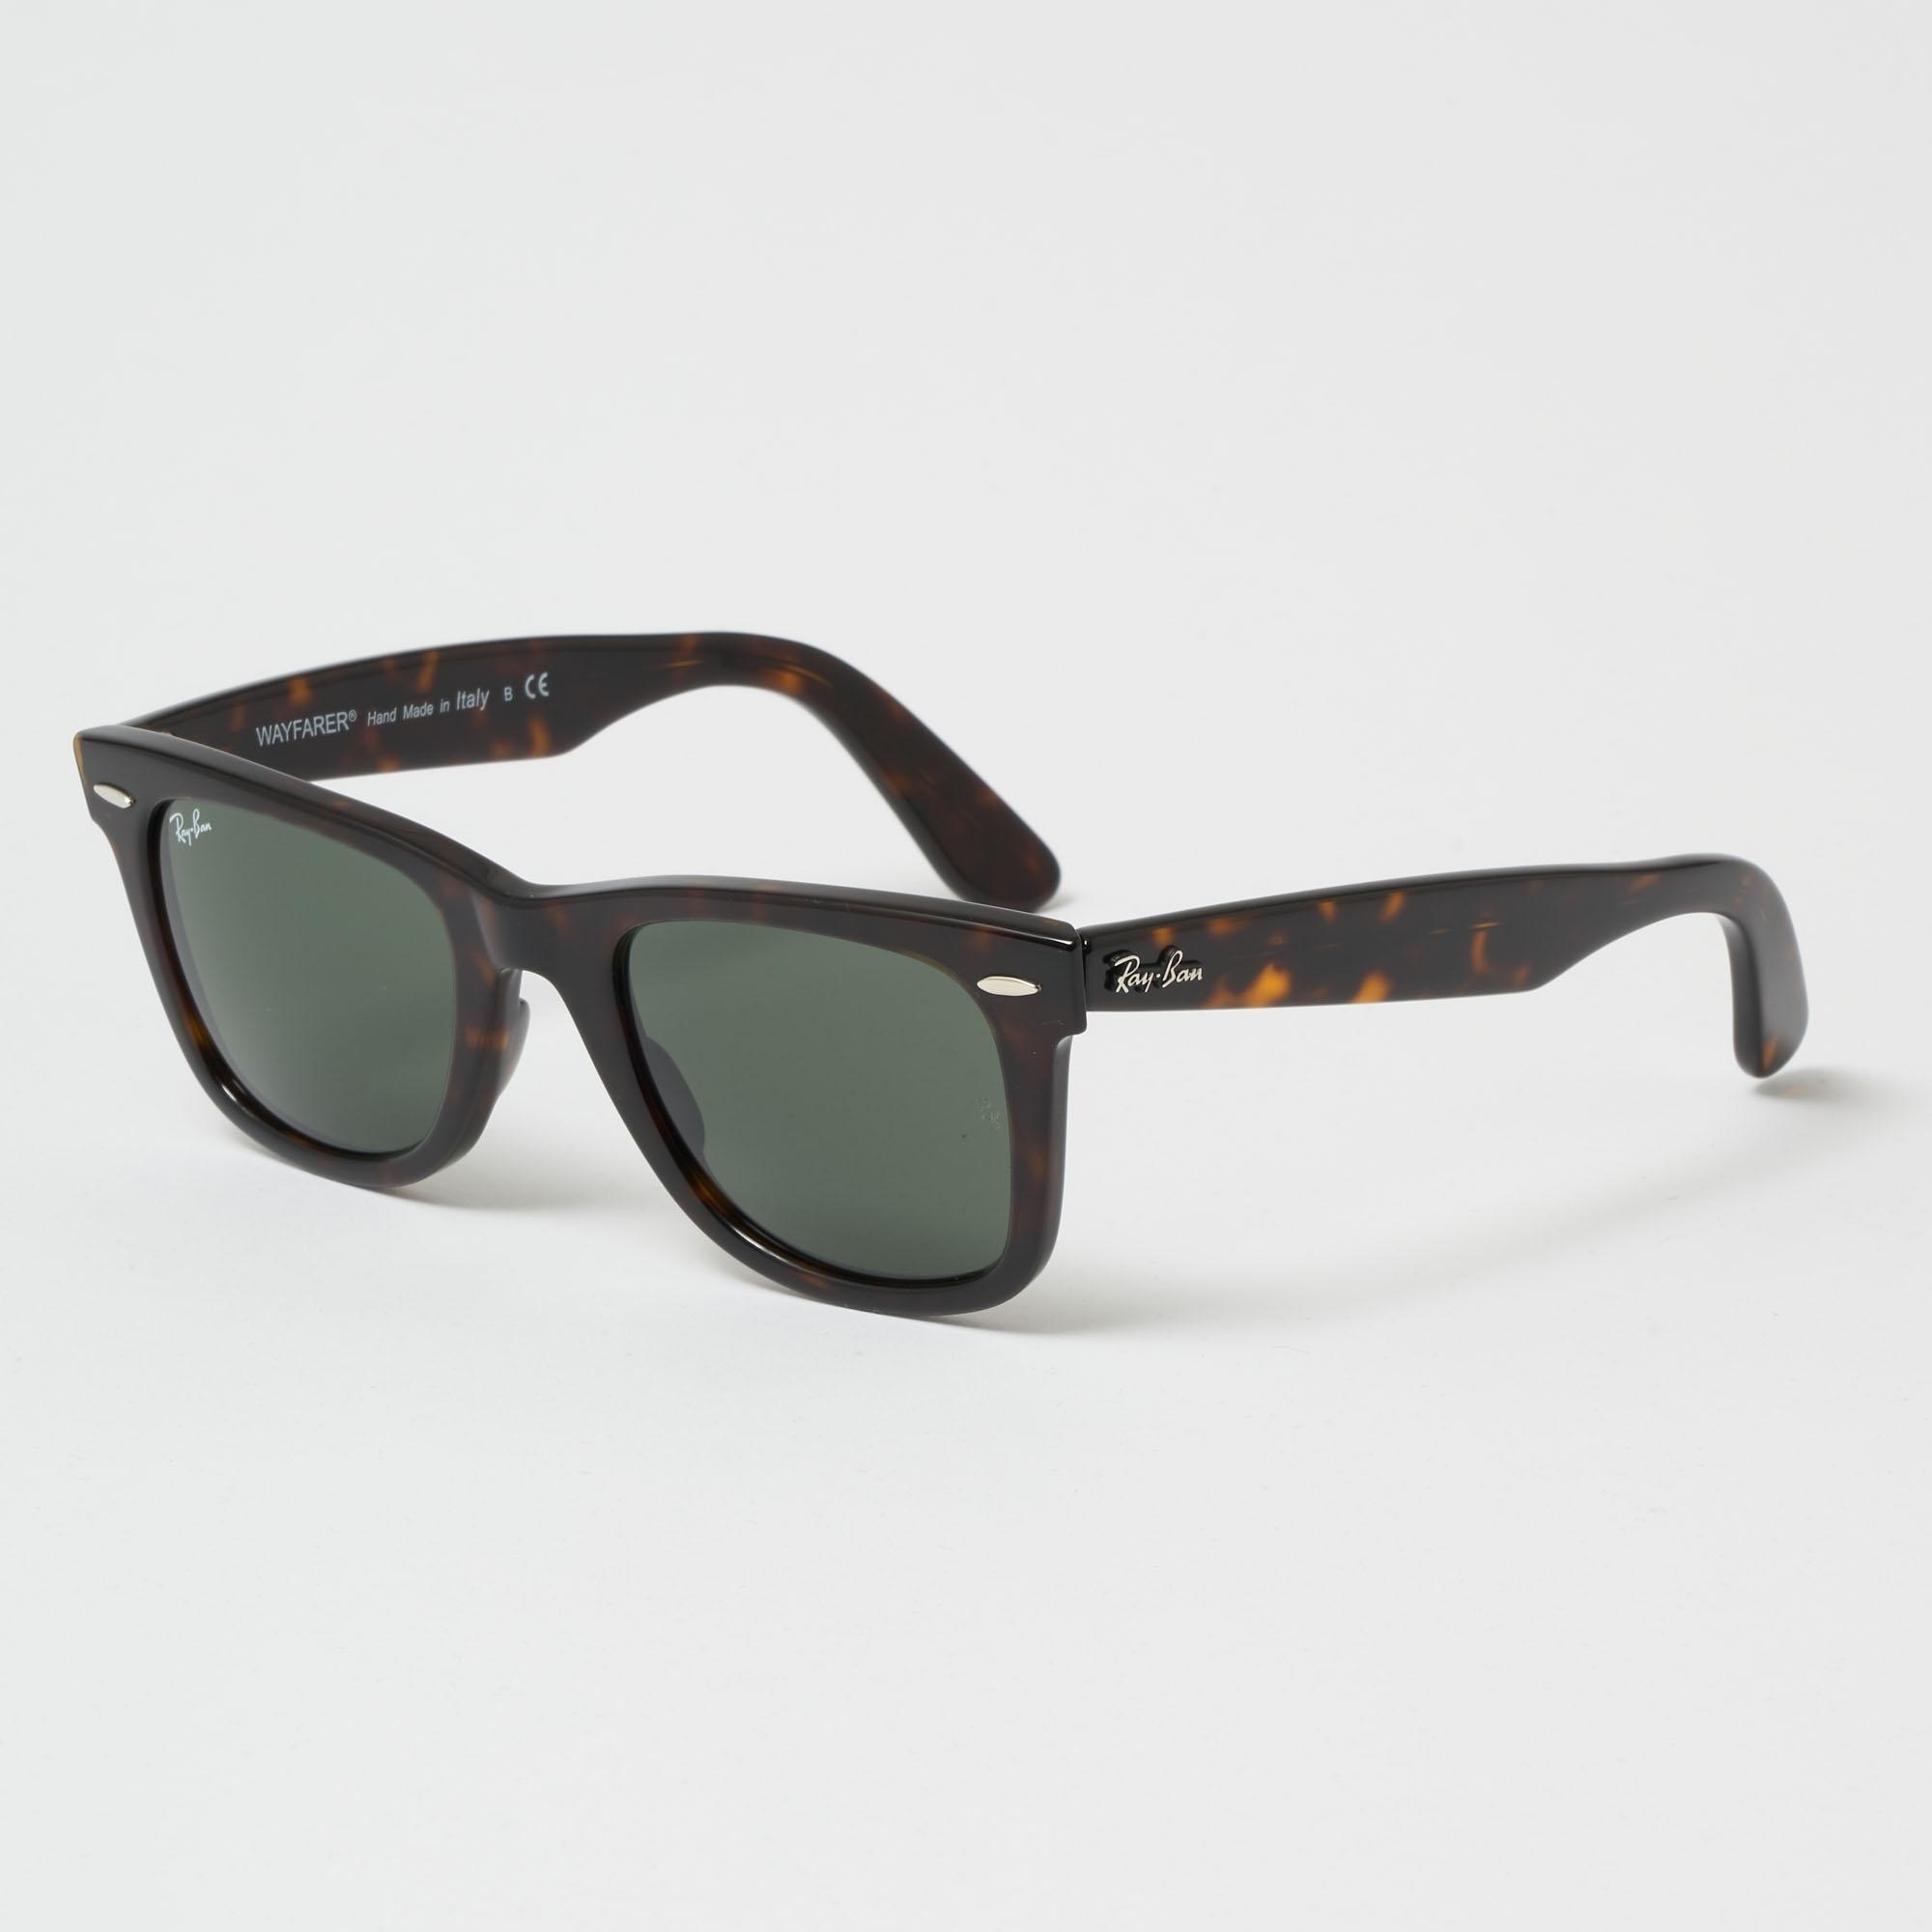 9311193da8 Tortoise Original Wayfarer Classic Sunglasses - Green Classic G-15 Lenses